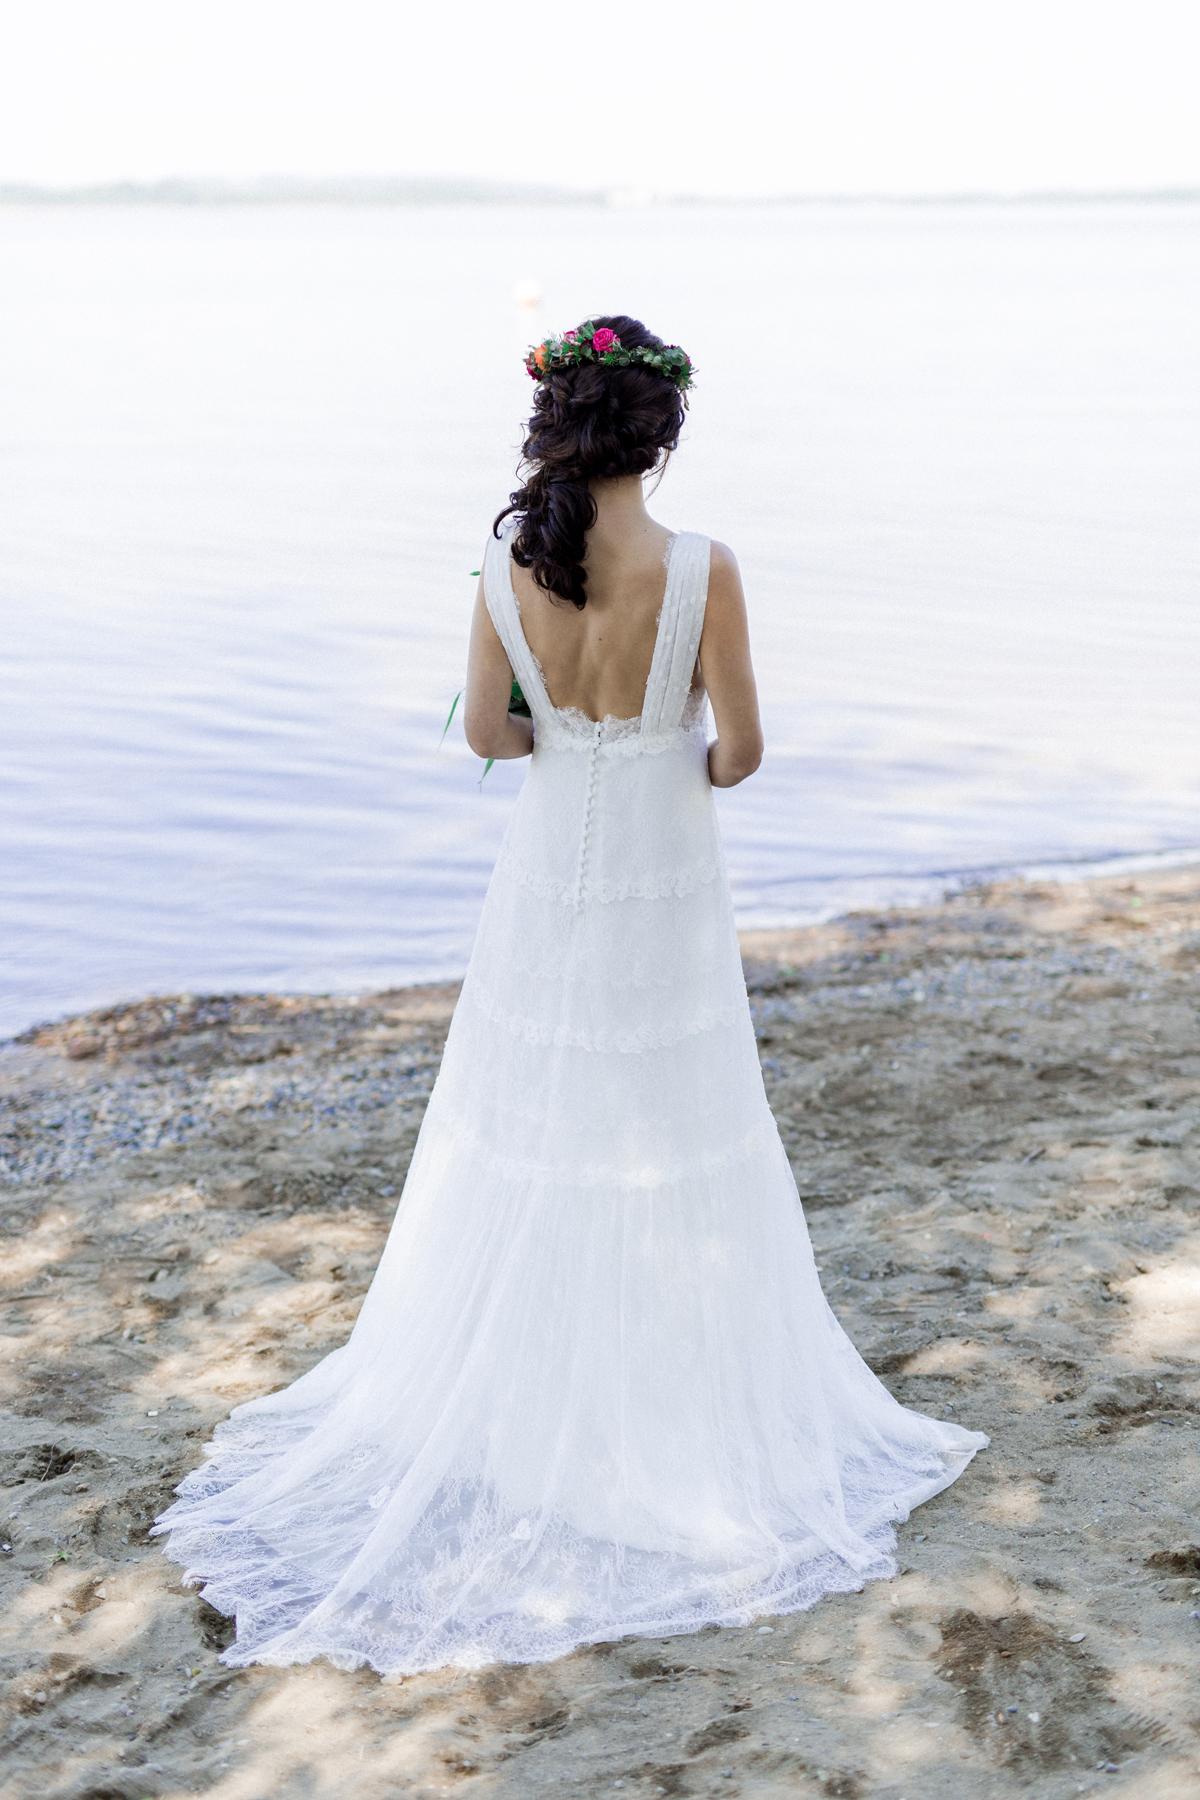 Brautkleid Boho mit Schleppe